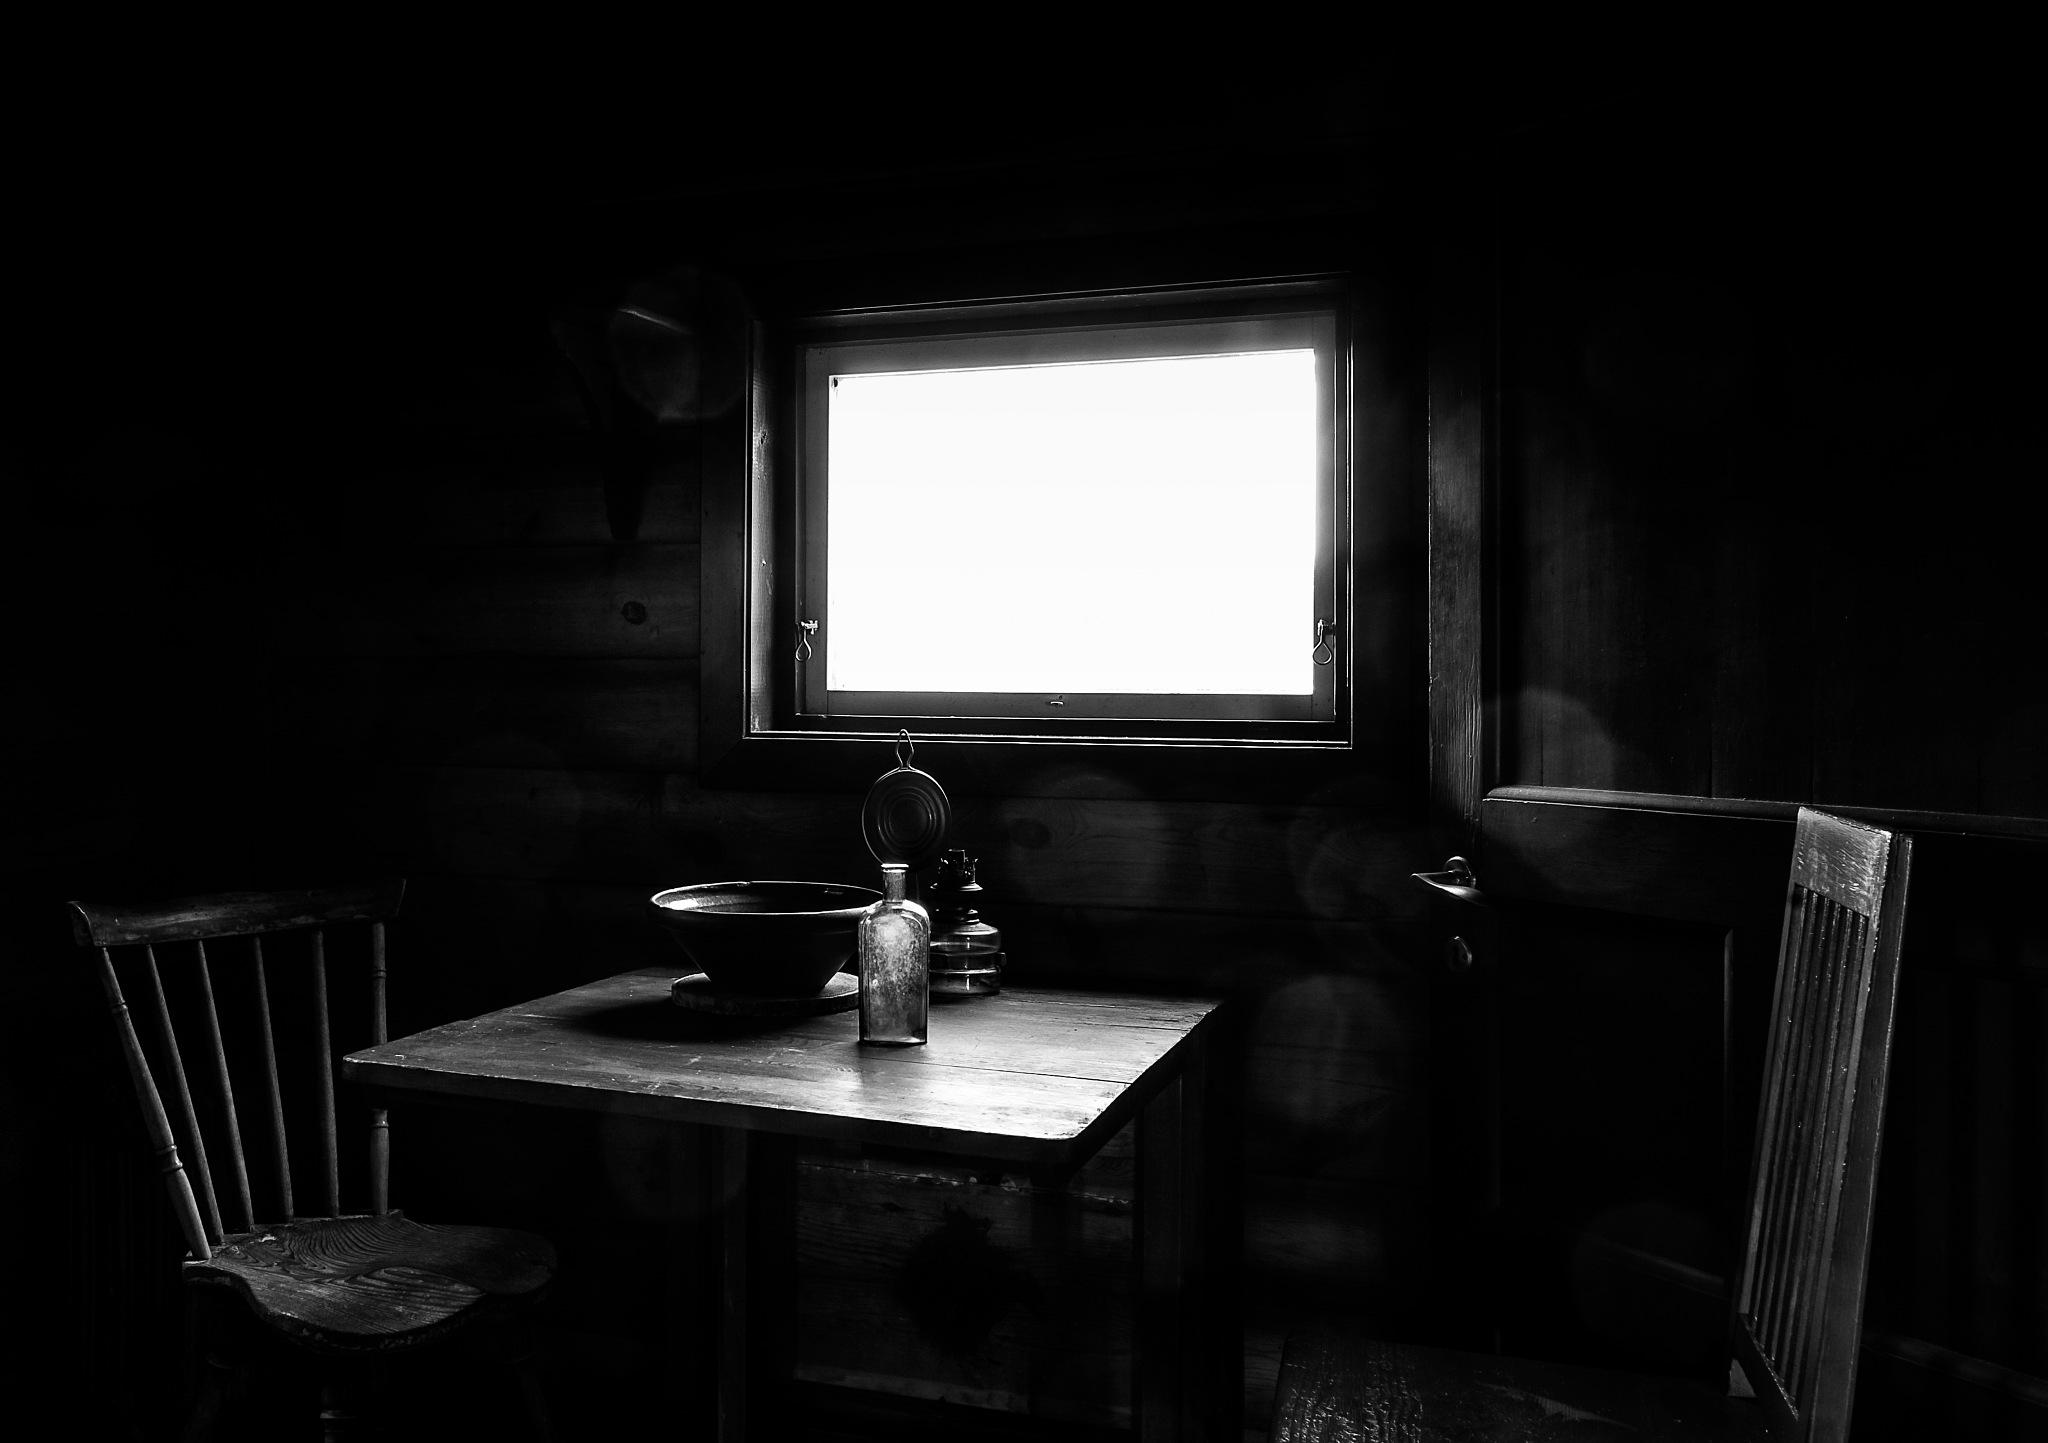 In the kitchen by Stefan Tyrbo